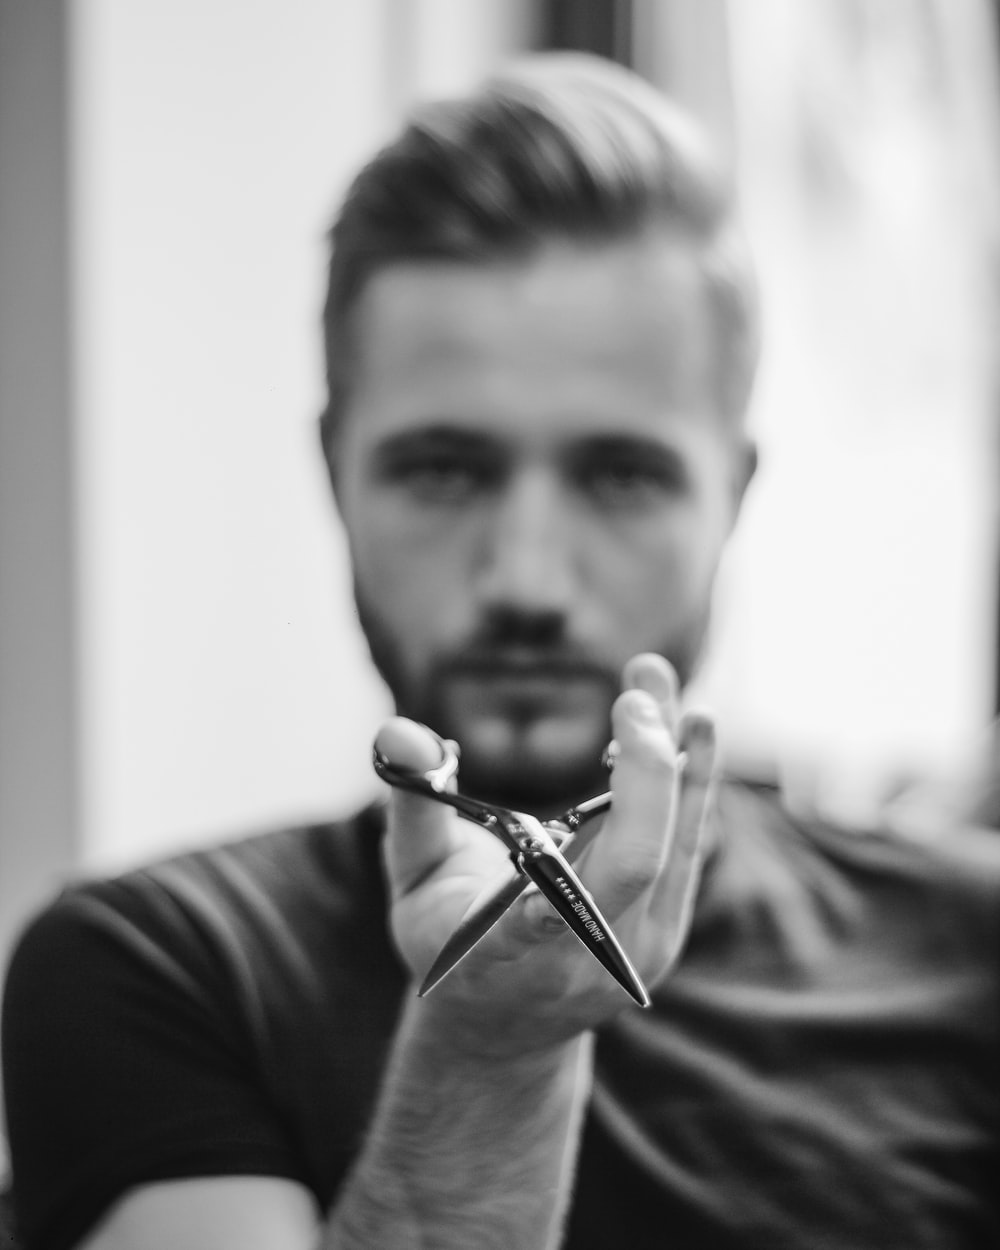 shallow focus photo of man holding scissors